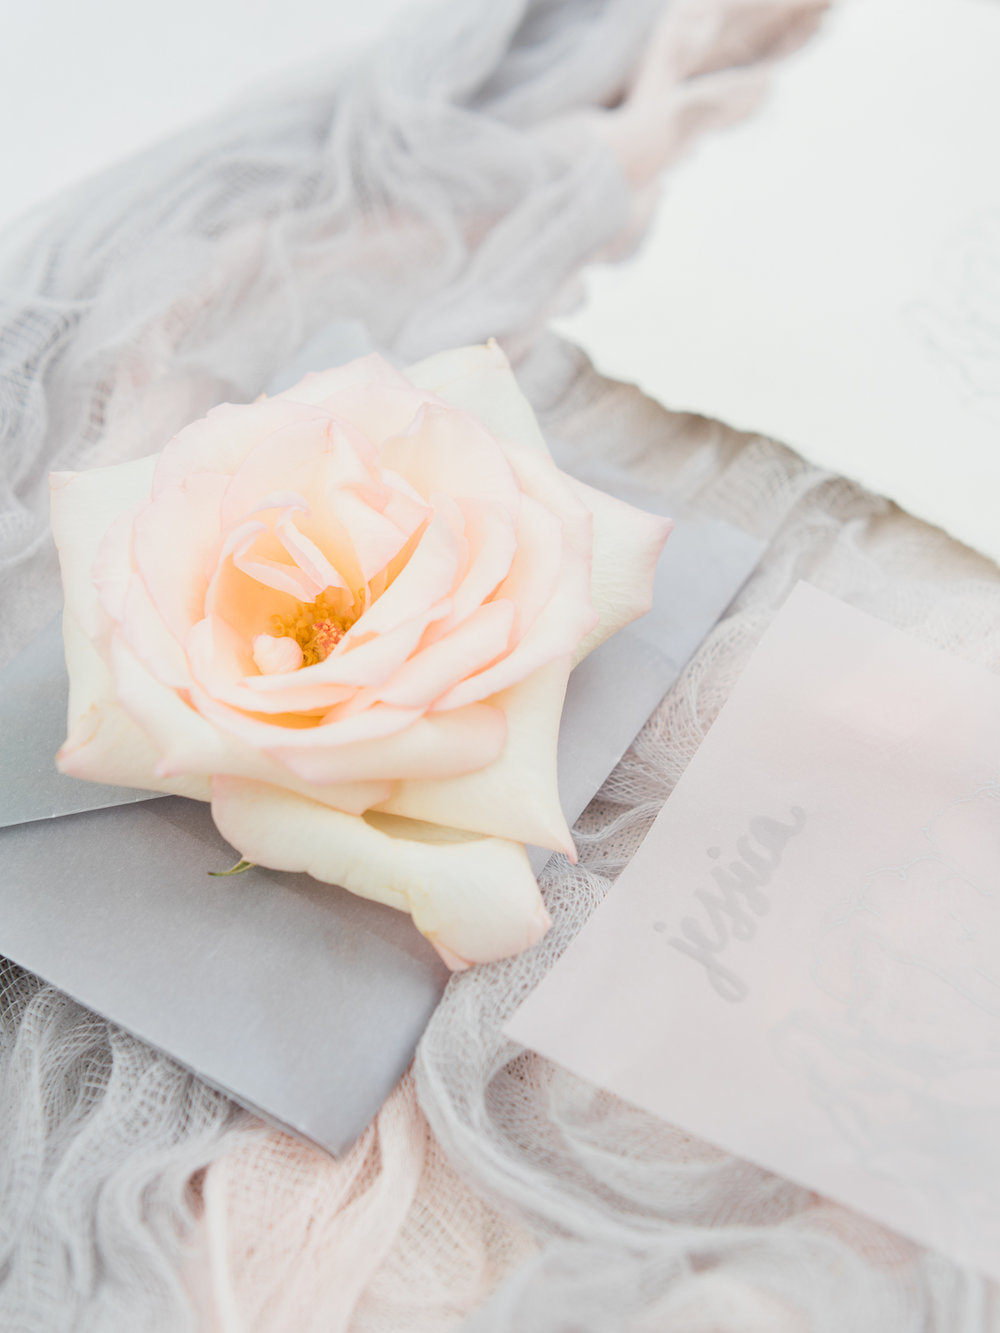 christinadavisphotography-romanticwedding-gardenweddinginspiration76.jpg